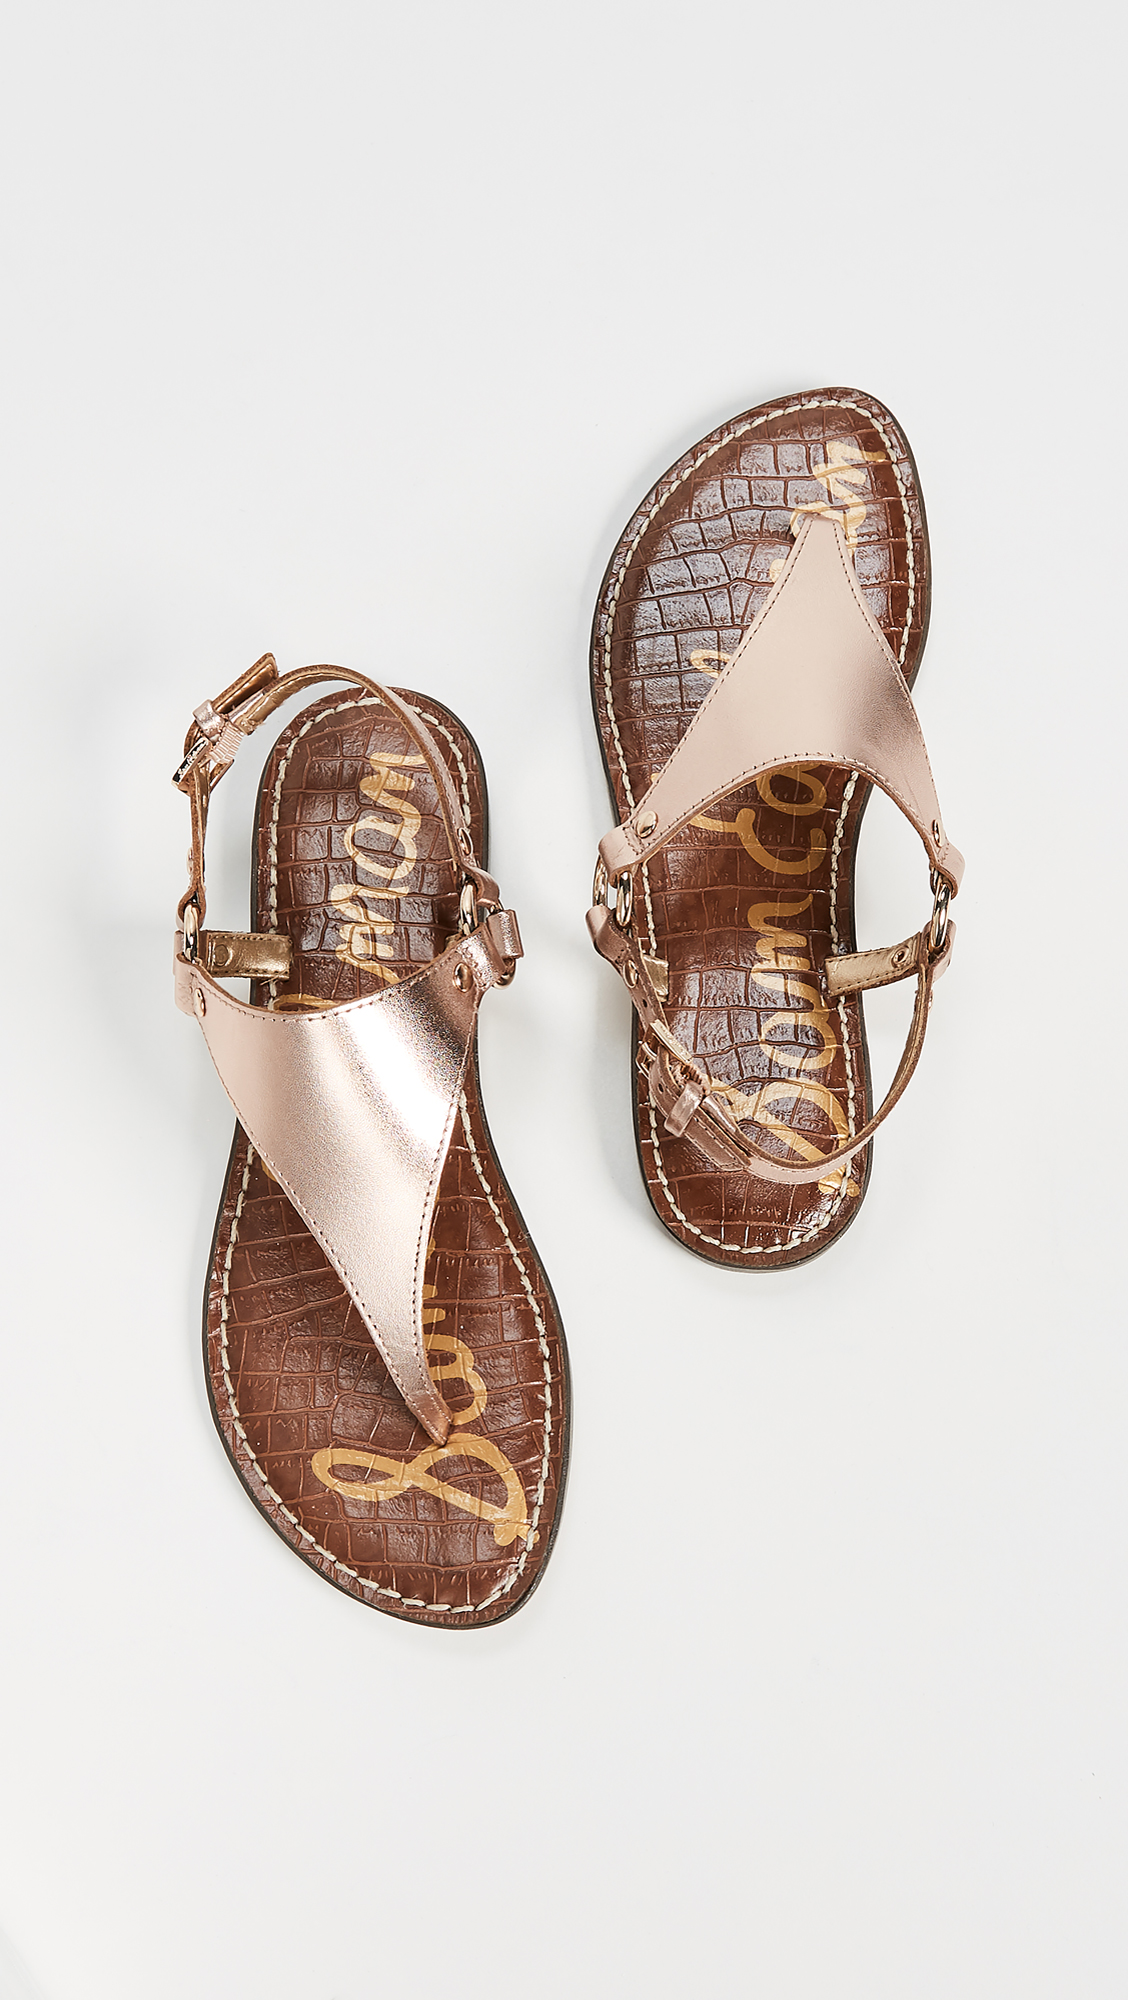 847c159b28e3 Sam Edelman Greta Flat Sandals